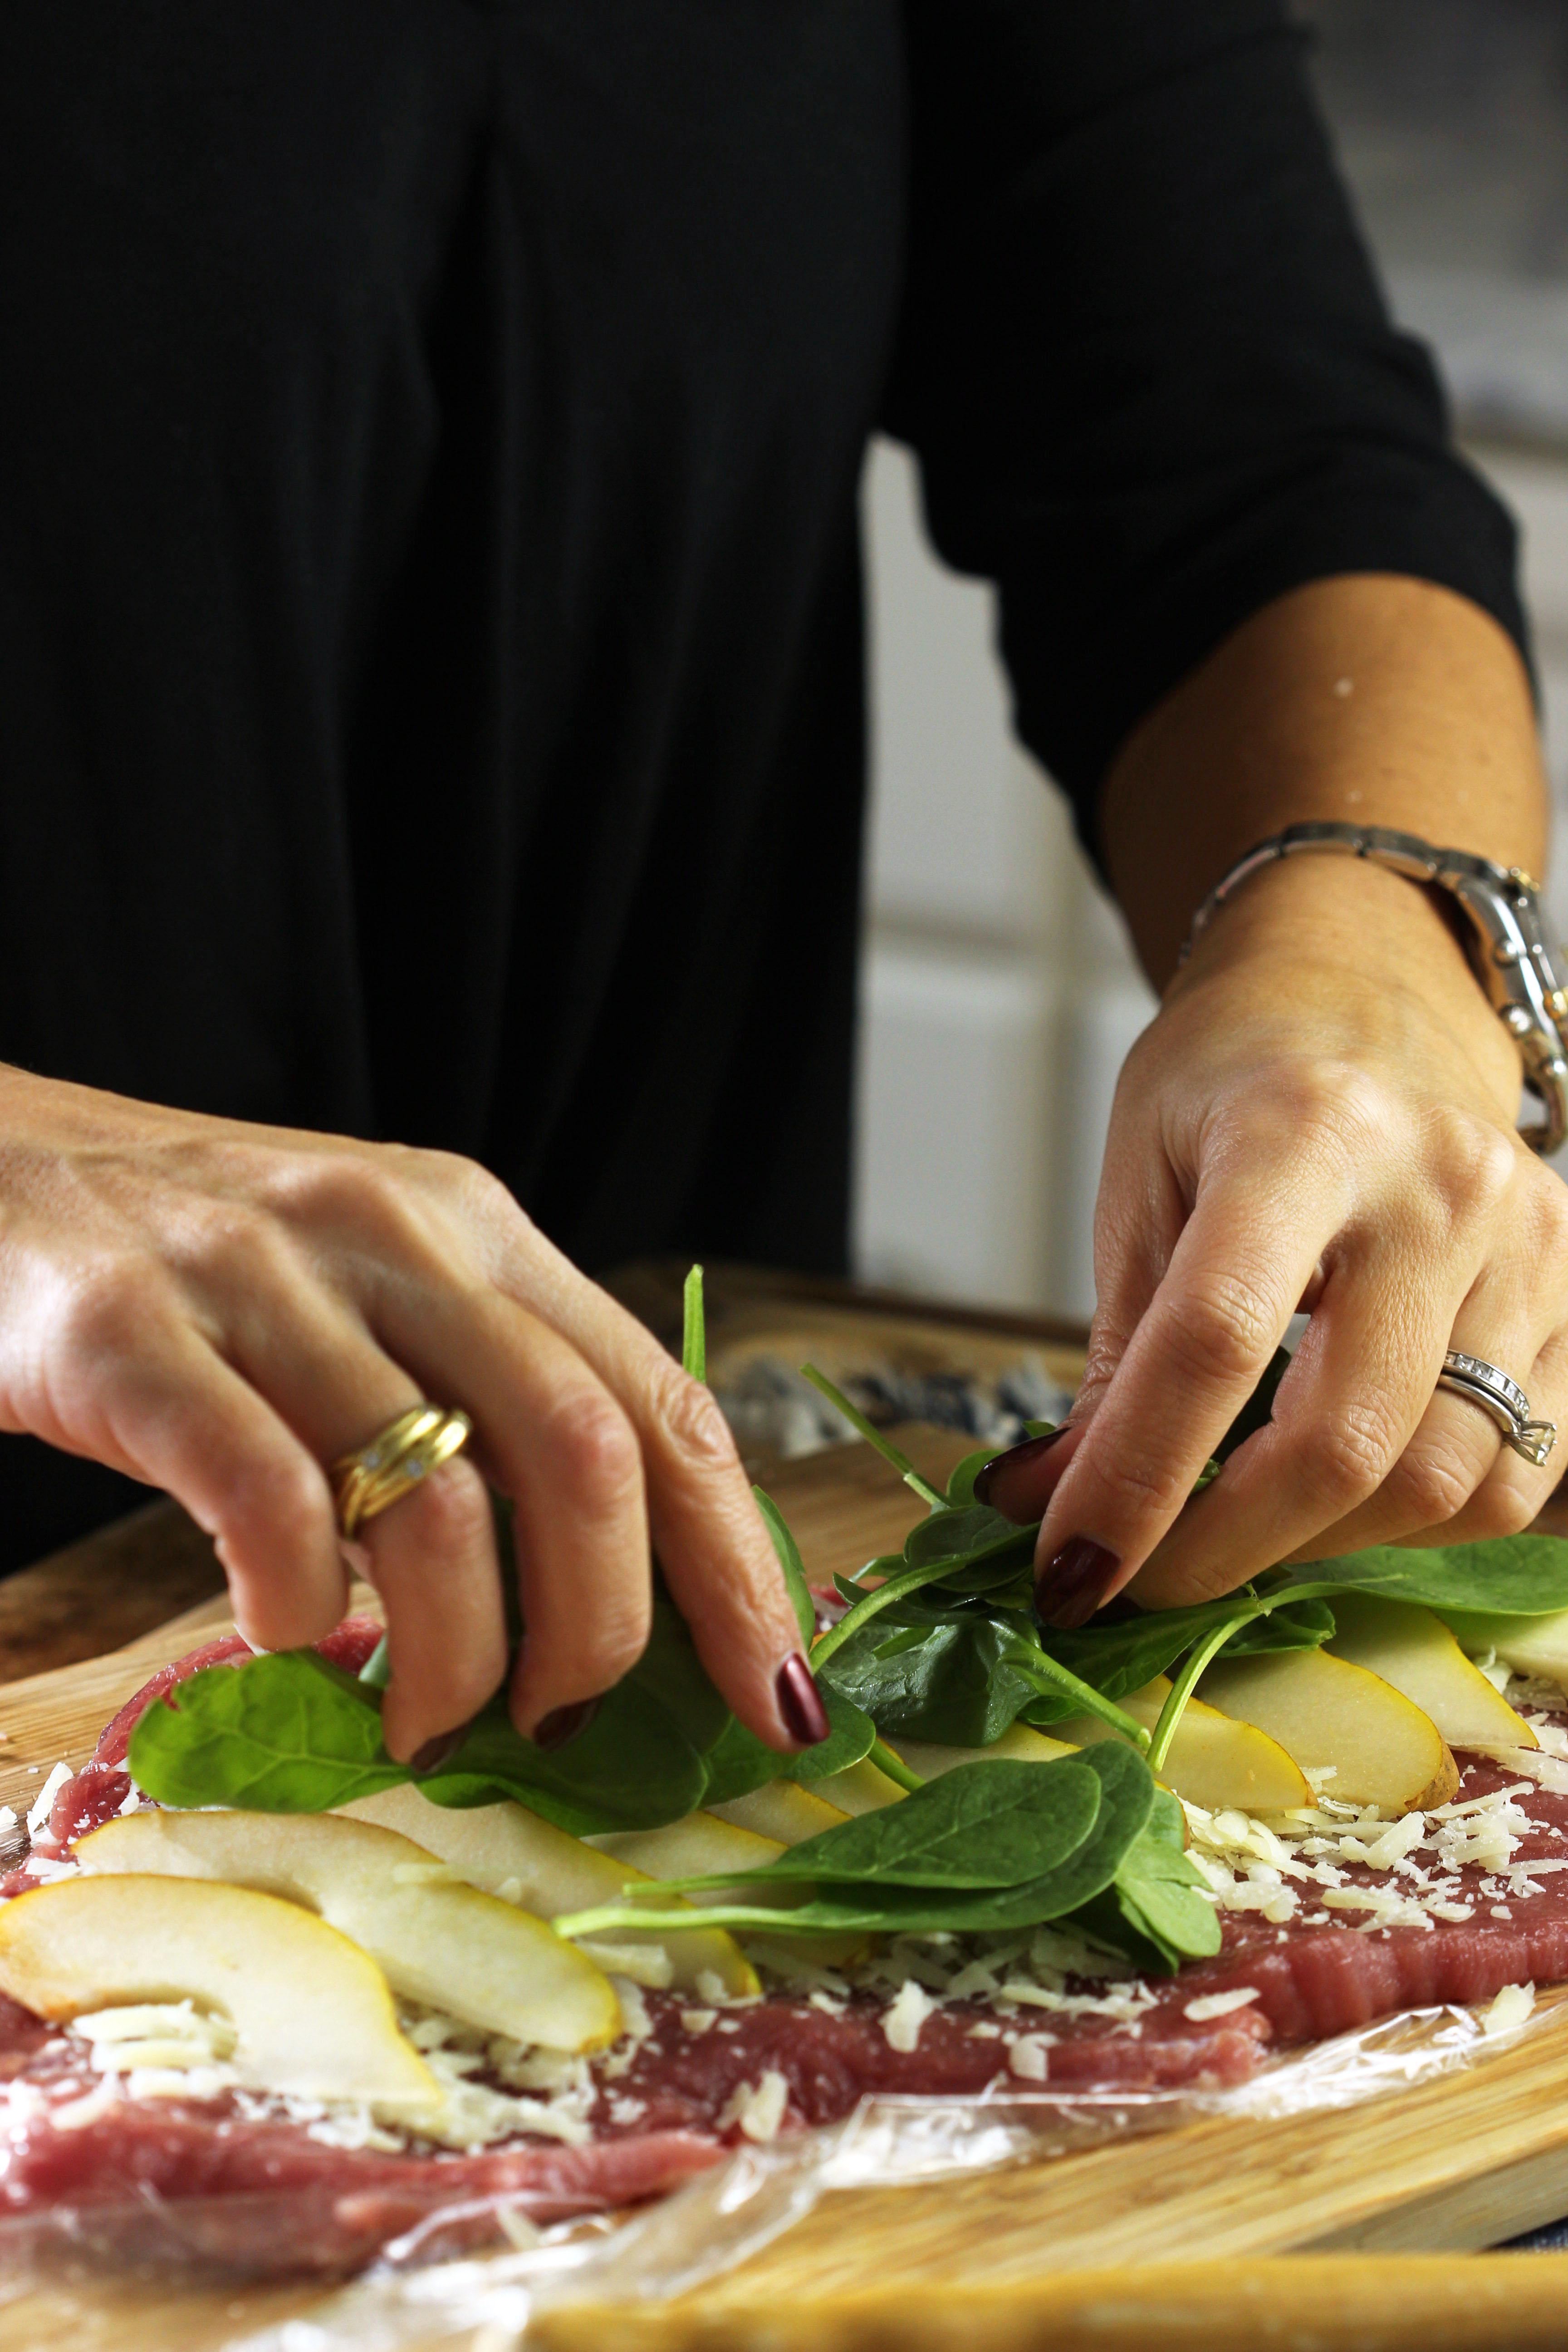 How to Make Pork Tenderloin